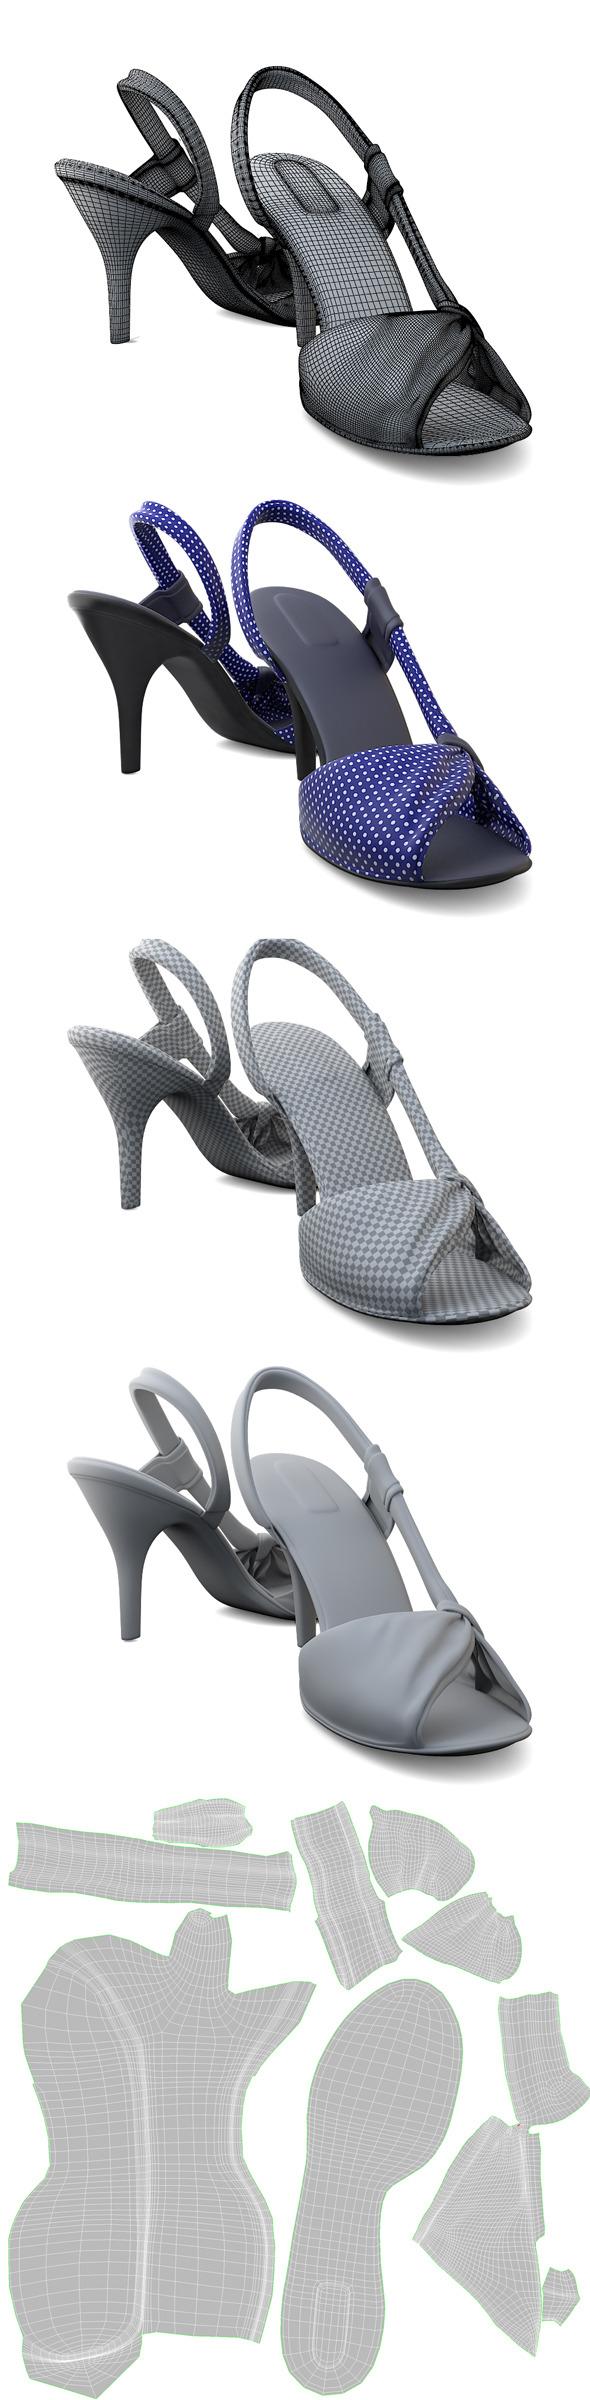 3DOcean Ladies Sandals 4175119